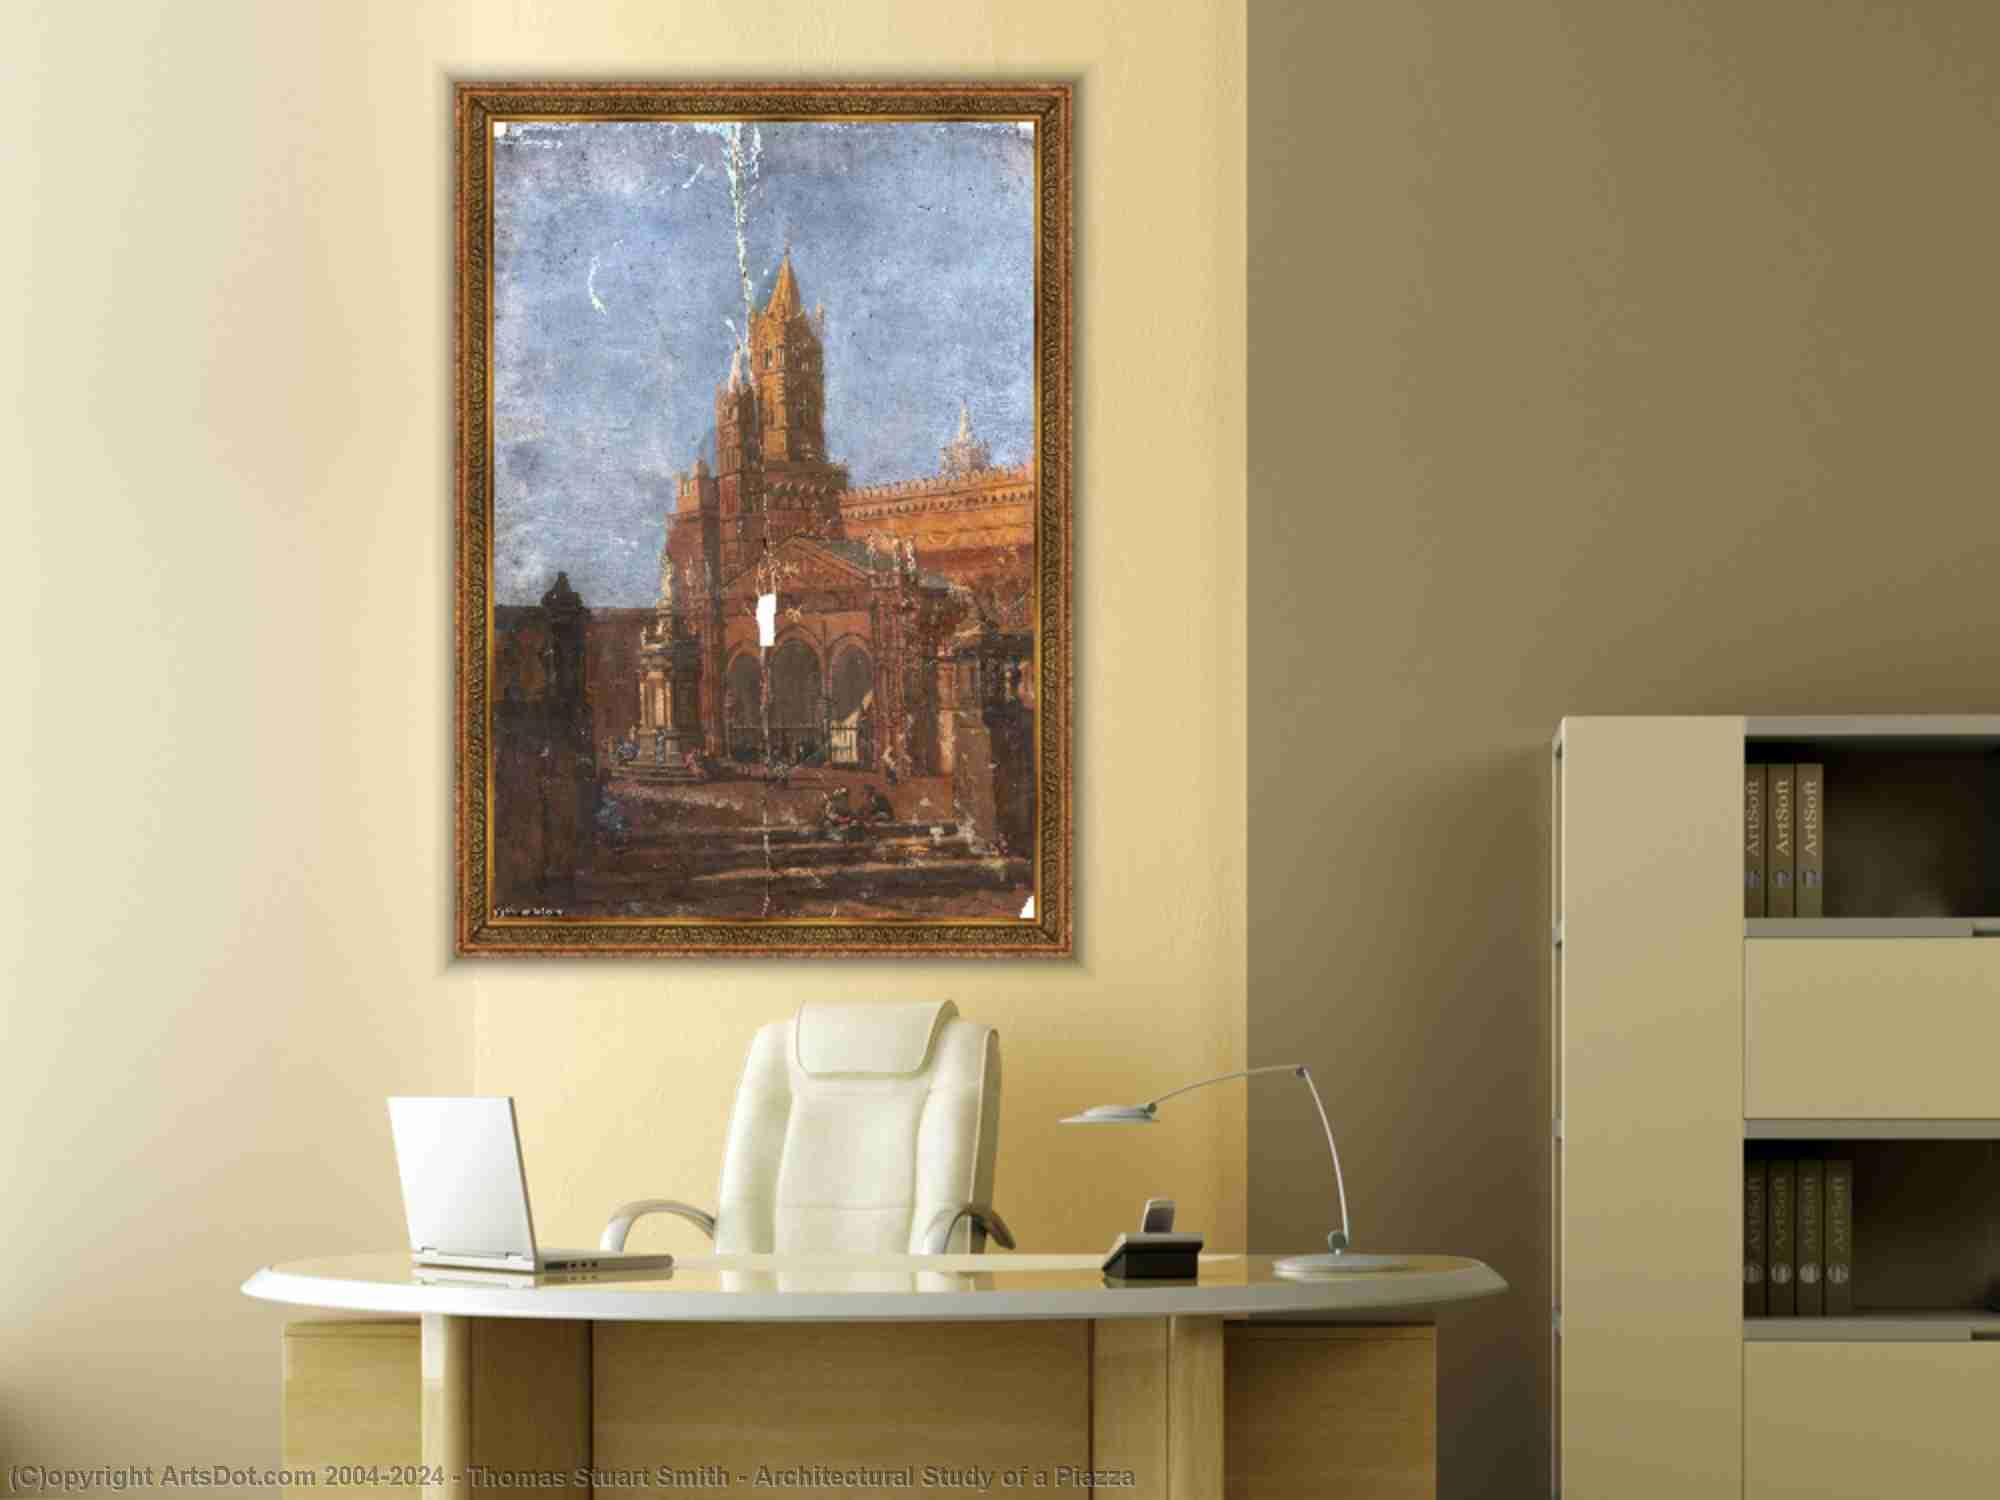 Thomas Stuart Smith - Estudio de arquitectura todaclasede  Un  plaza